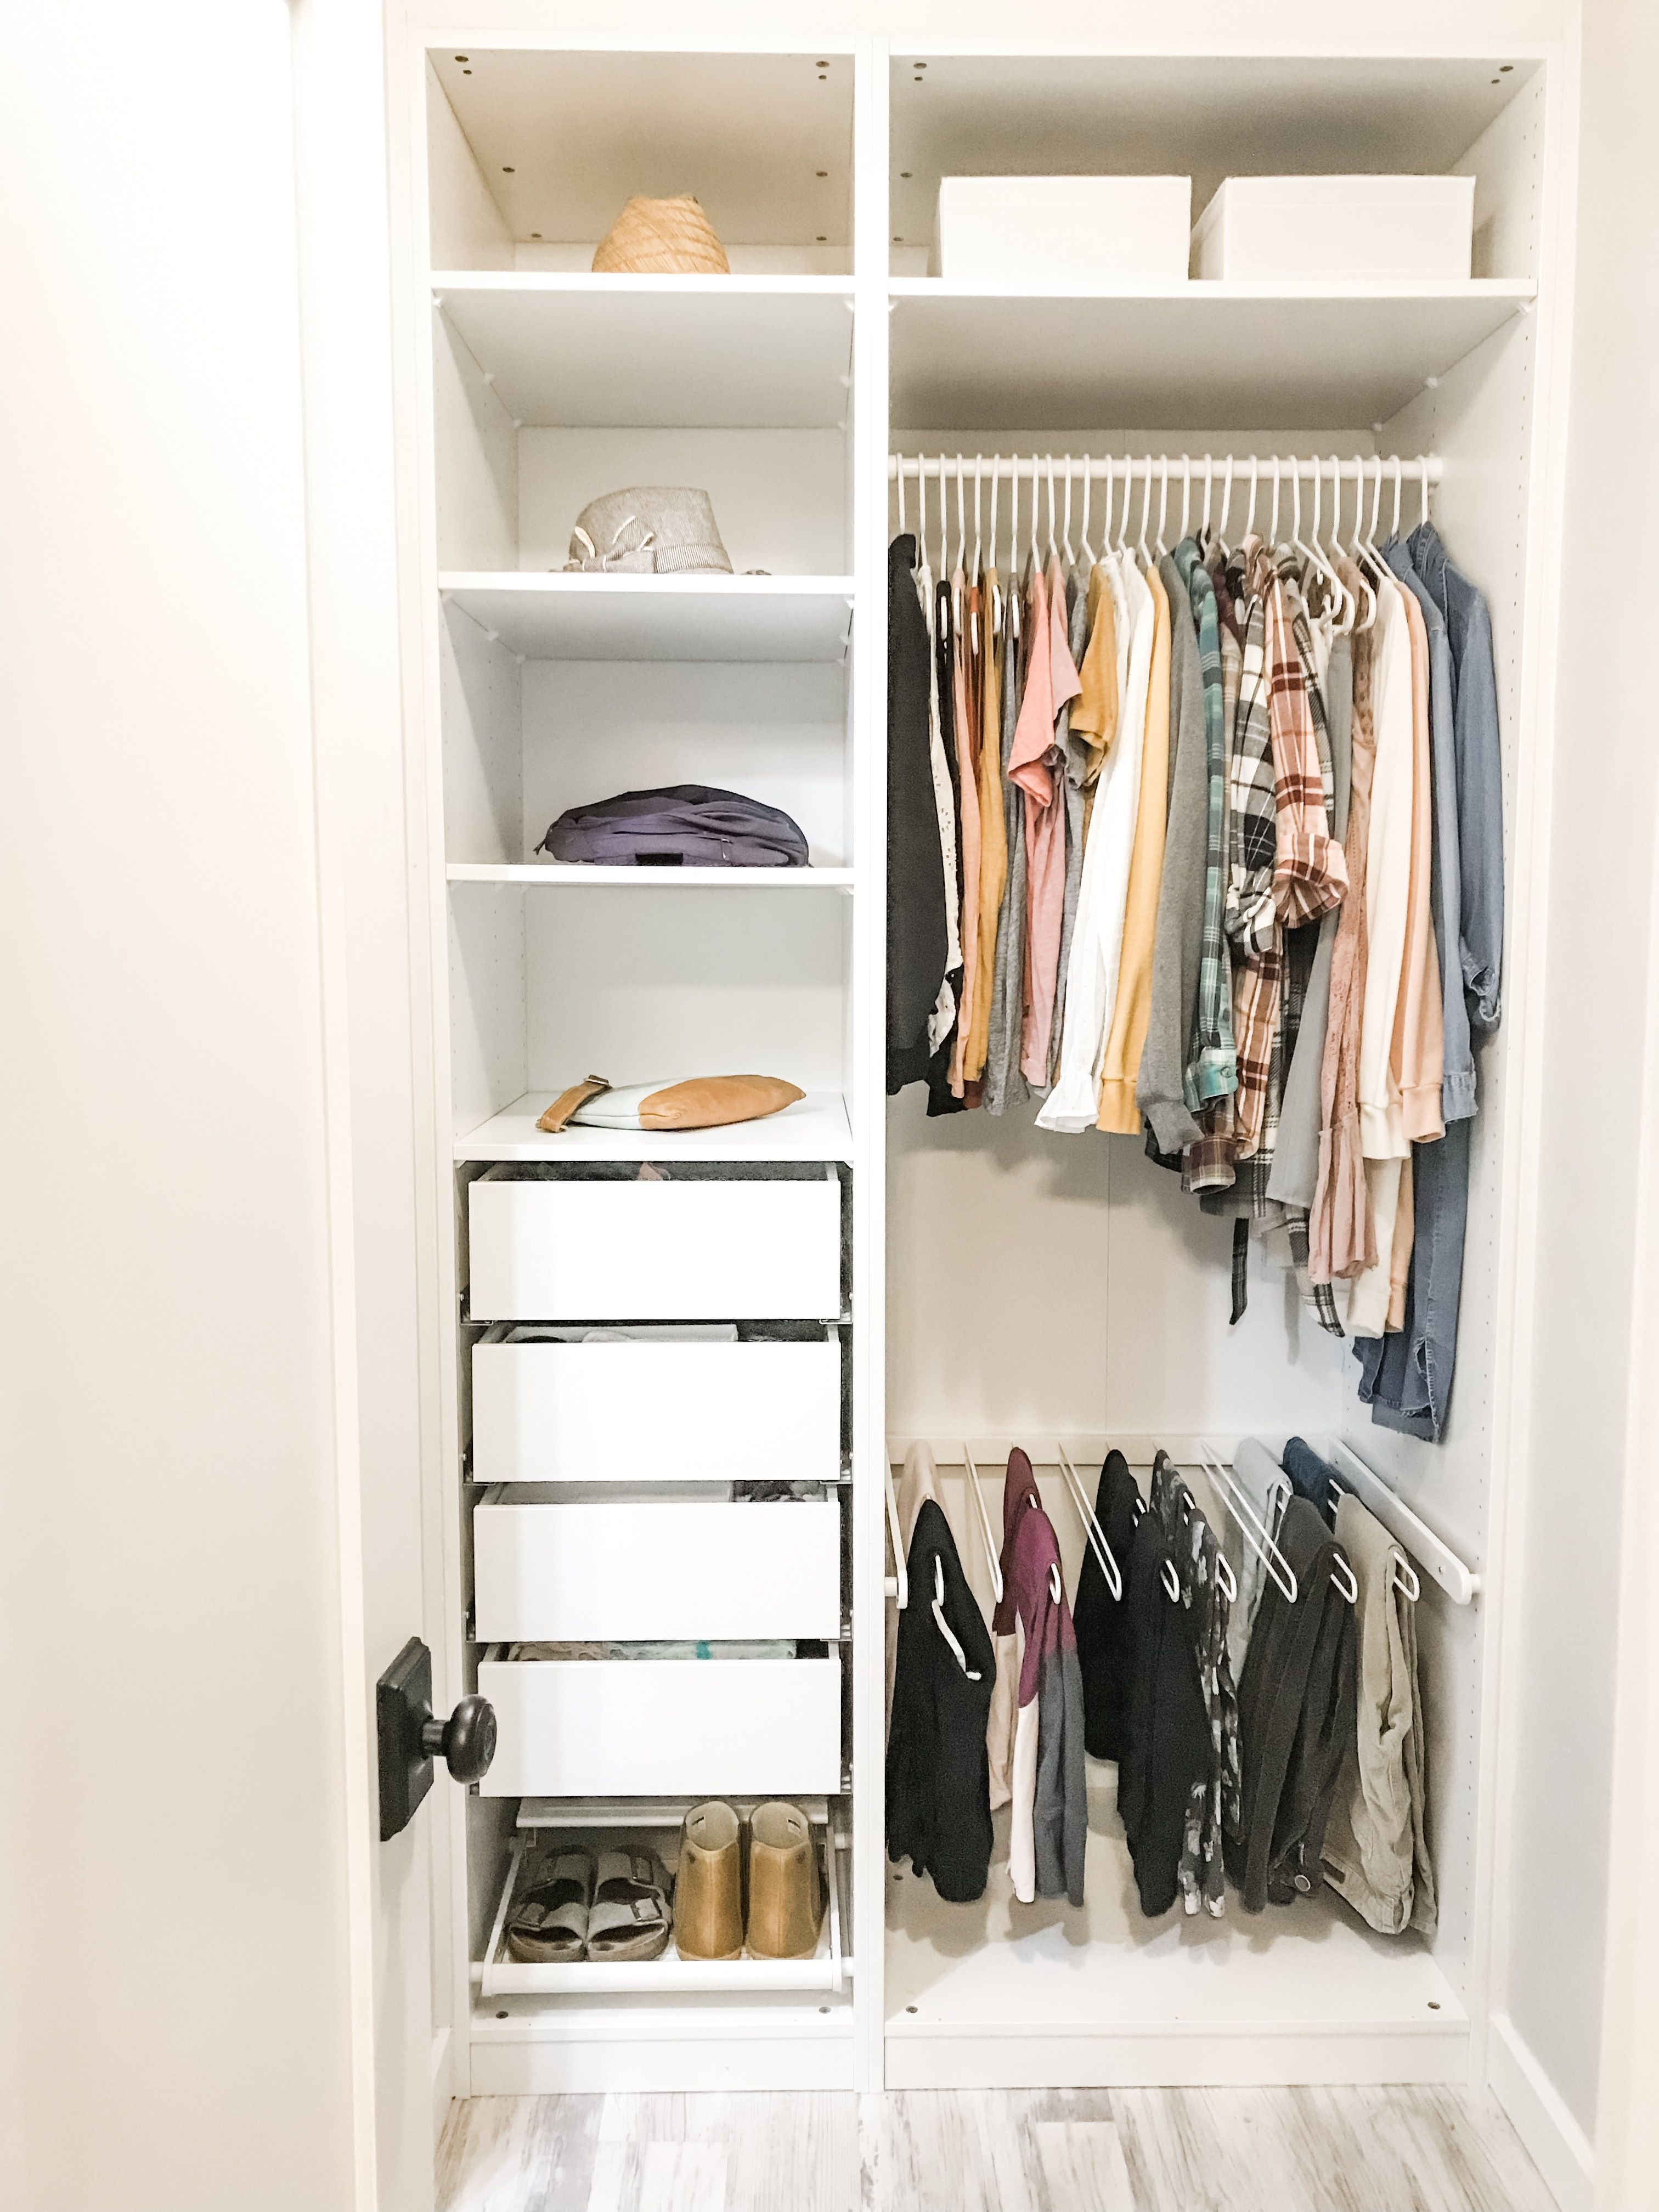 Rachel S Closet Wardrobe Room Closet Layout Bedroom Closet Design